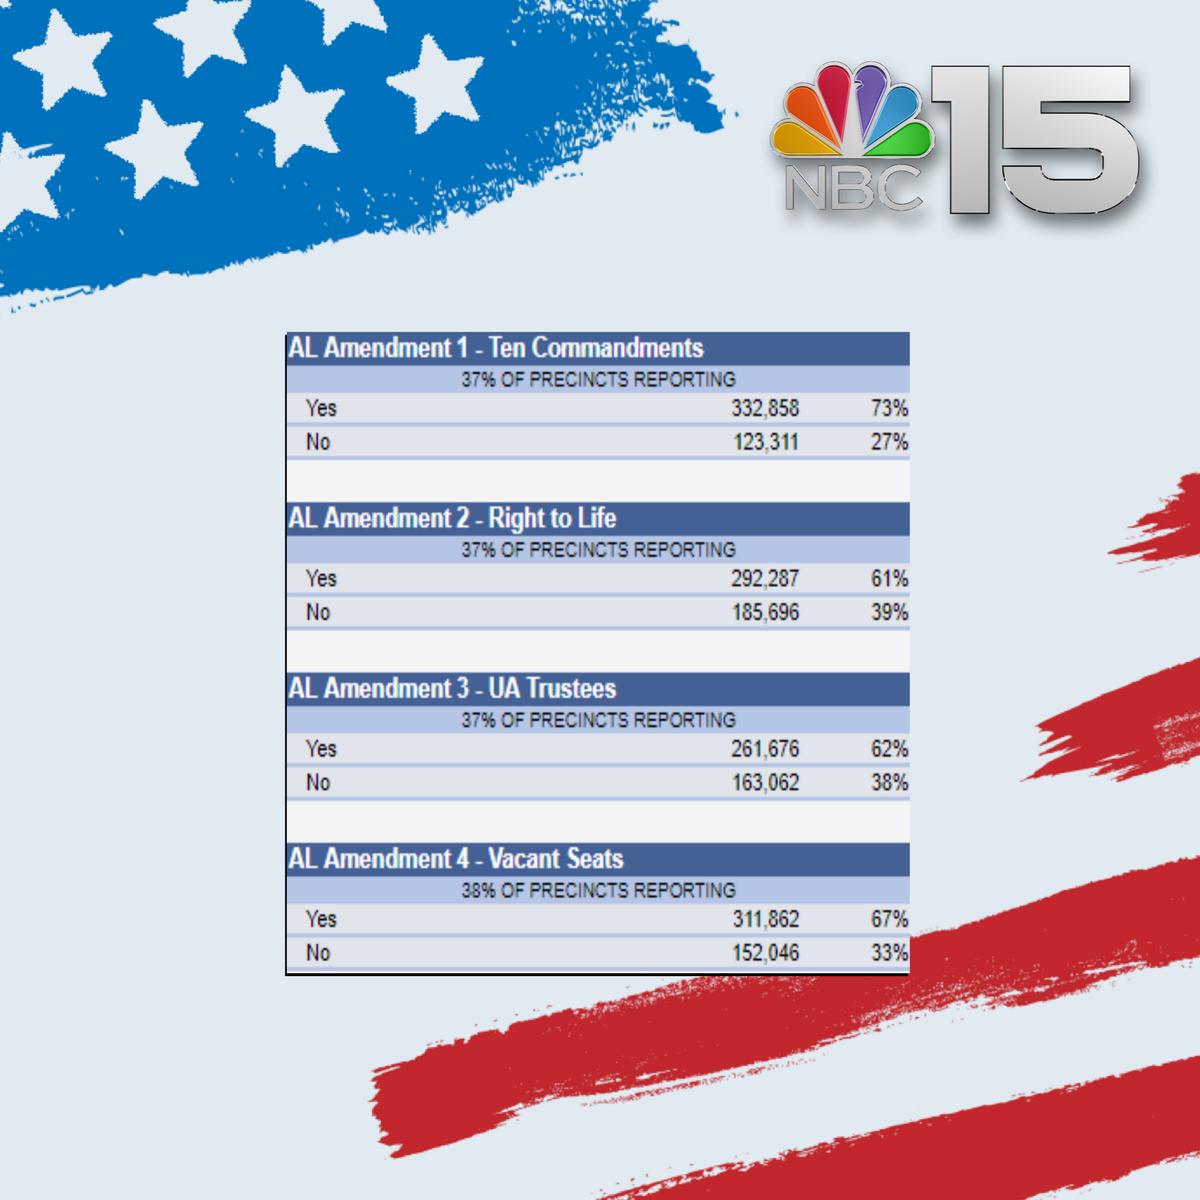 NBC 15 News on Twitter: